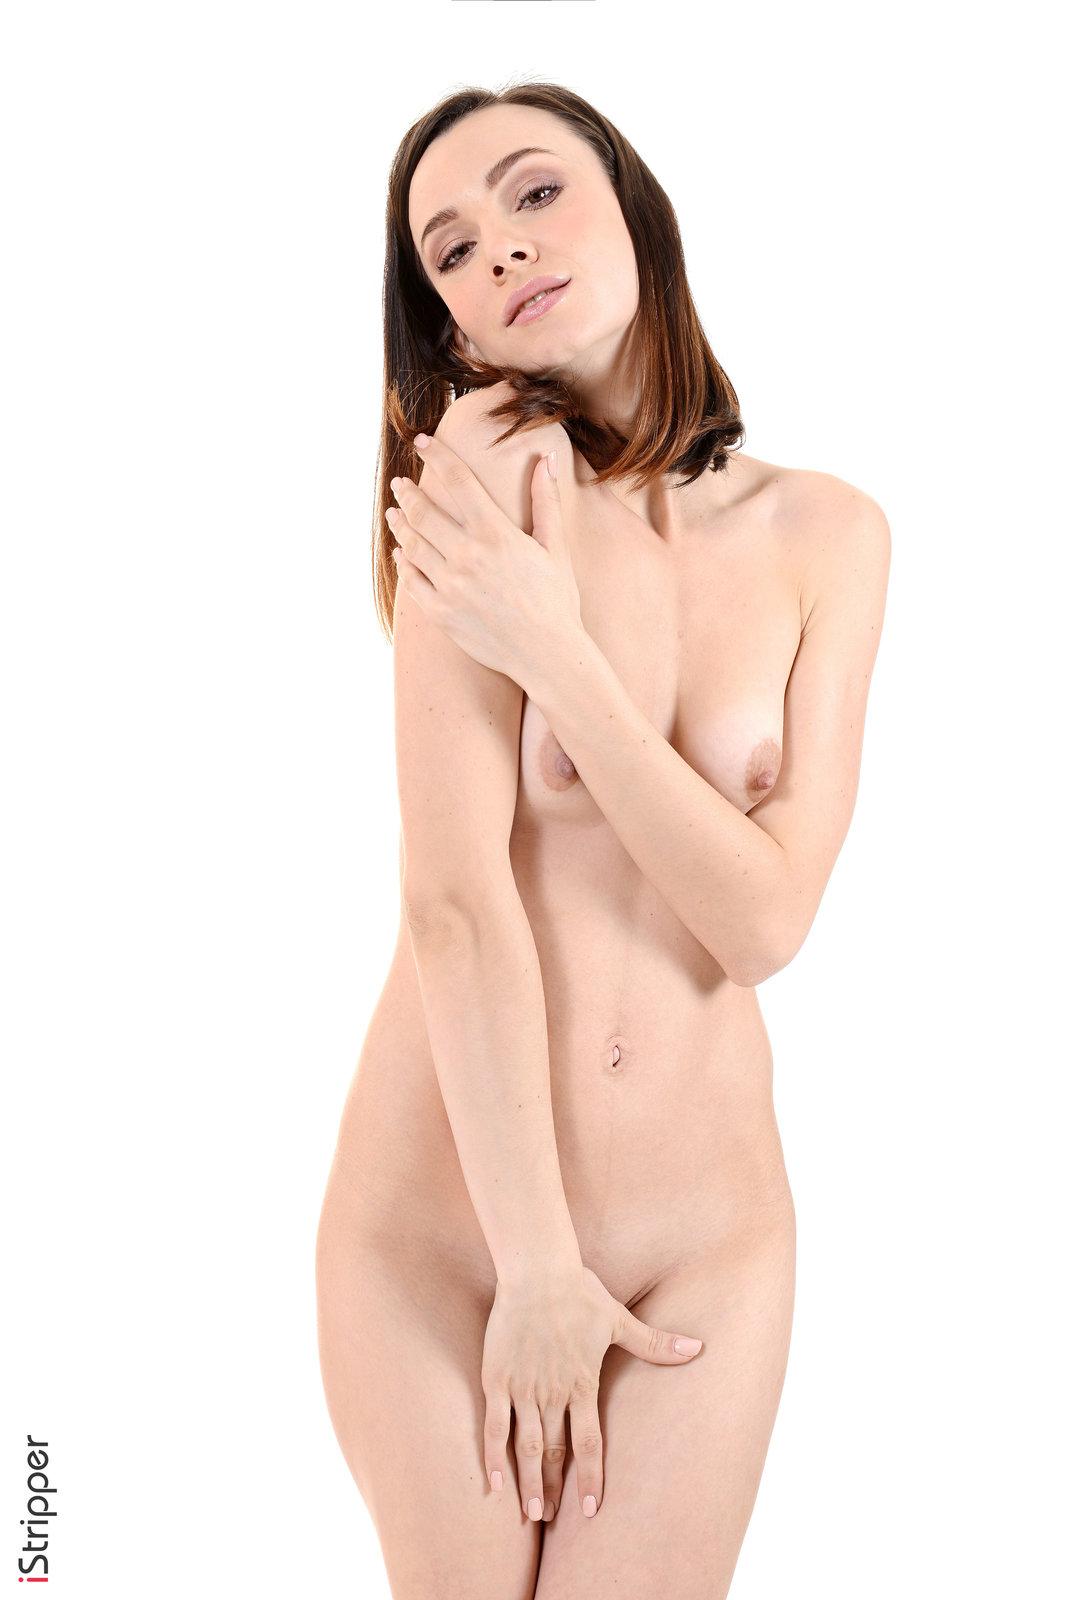 Zdjęcie porno - 135 - Zgrabna laska zdejmuje spódniczkę